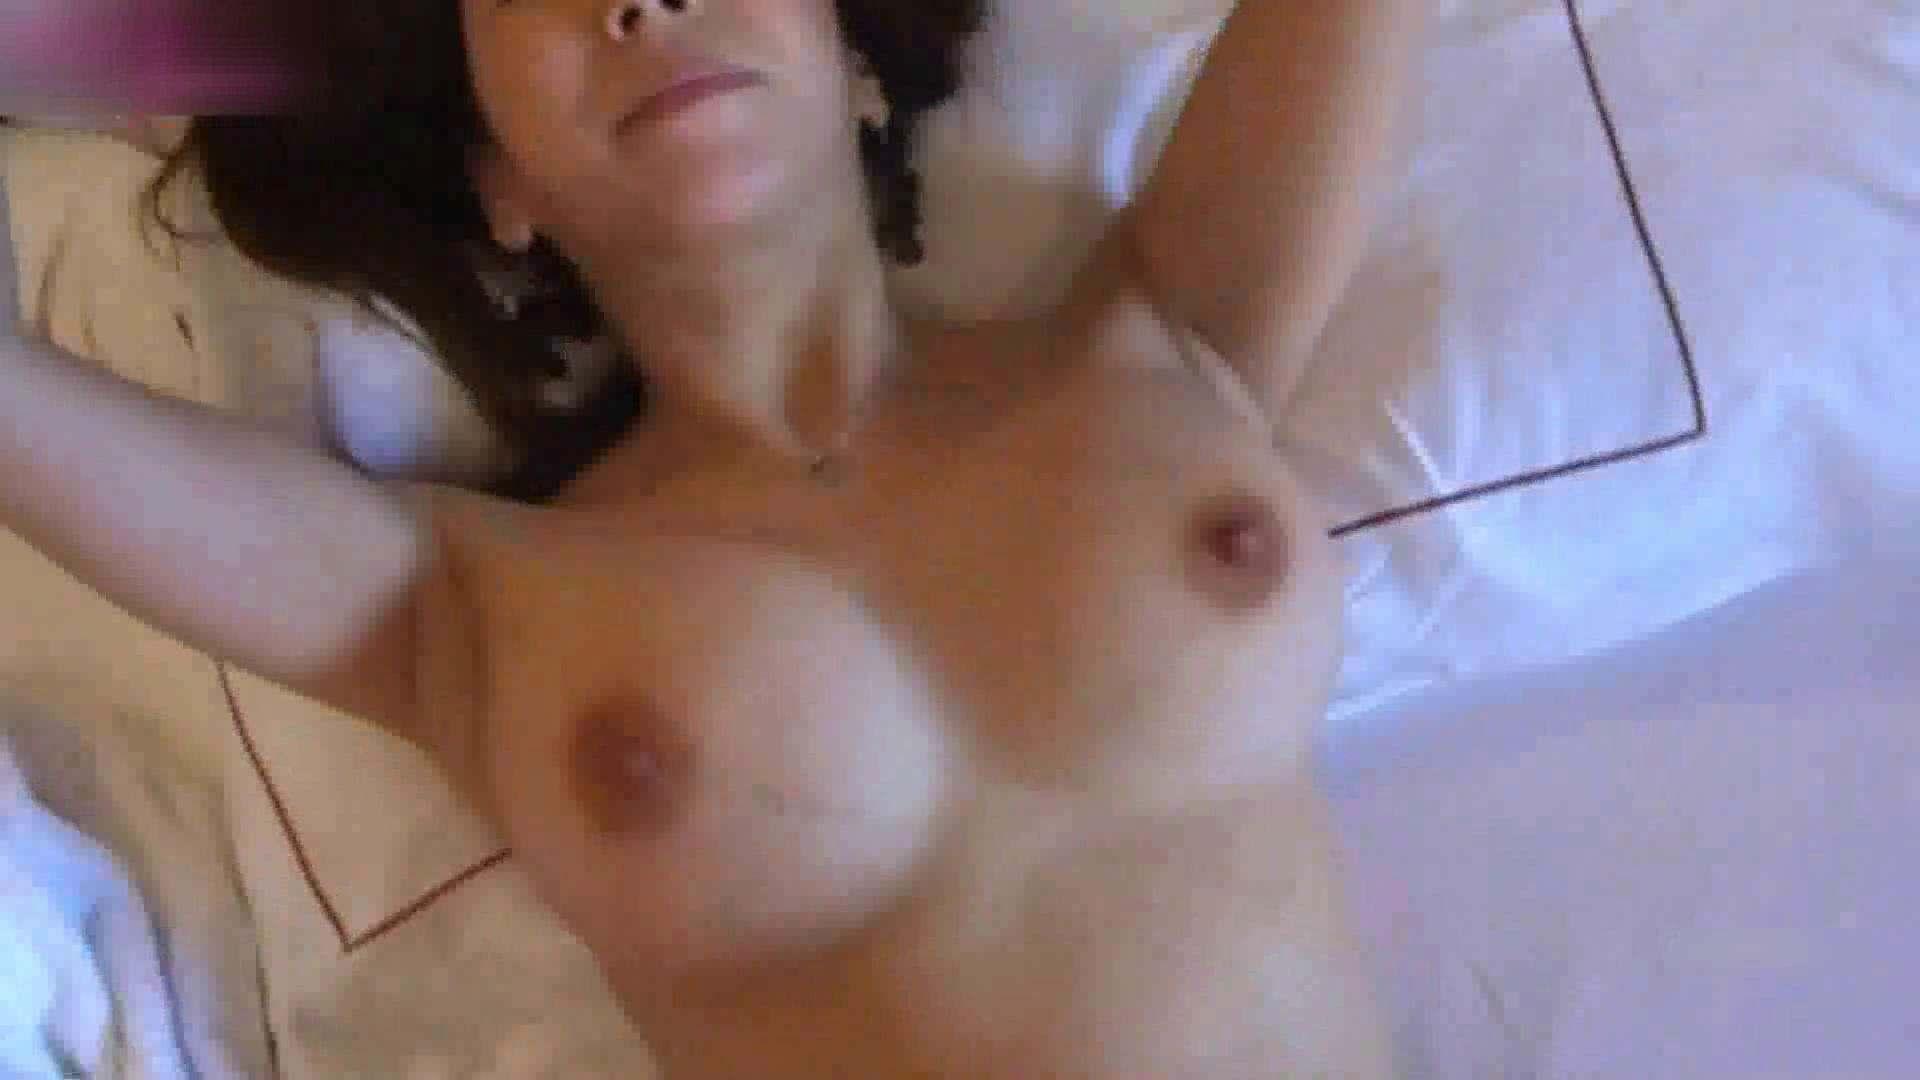 S級厳選美女ビッチガールVol.06 OLセックス | 美女ヌード  109画像 105